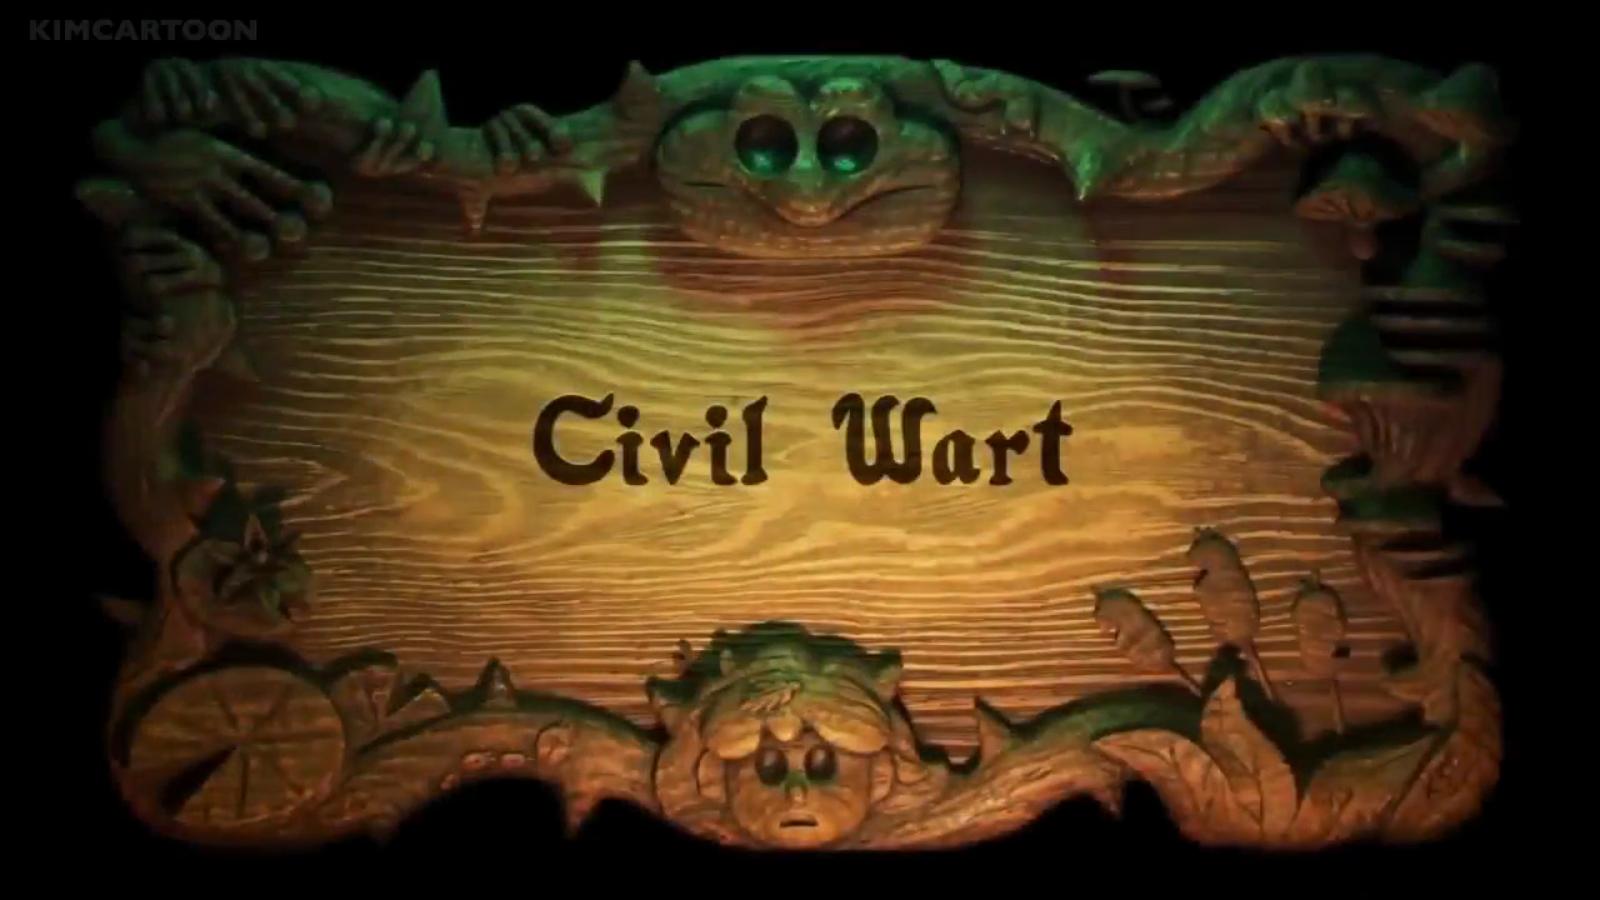 Civil Wart title card.png